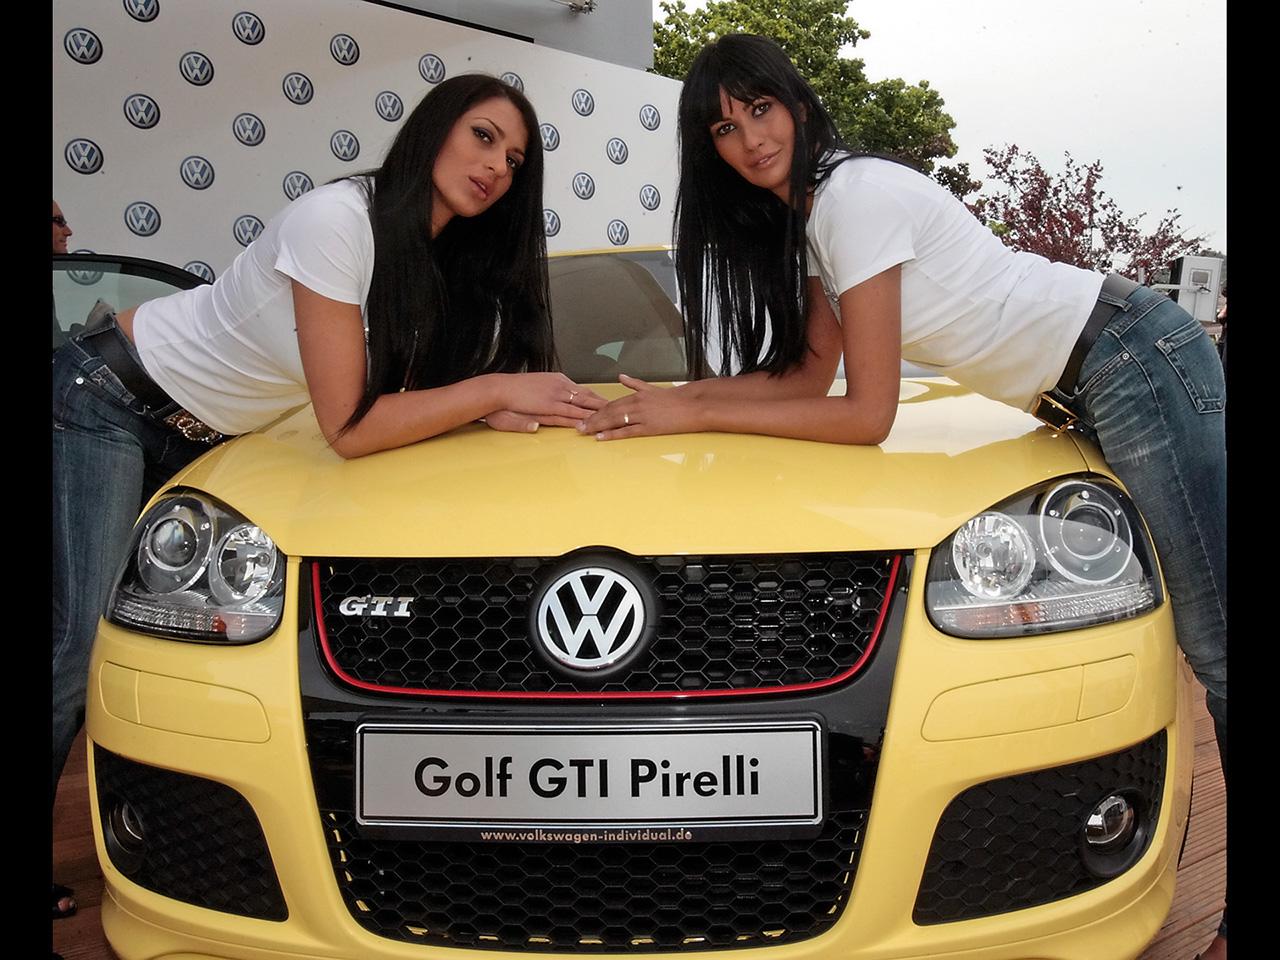 http://2.bp.blogspot.com/_YaQXL3FaULE/TM3uI590pcI/AAAAAAAAAHo/TIkzjxJc0ow/s1600/2008-Volkswagen-Golf-GTI-Pirelli-Girls-1280x960.jpg